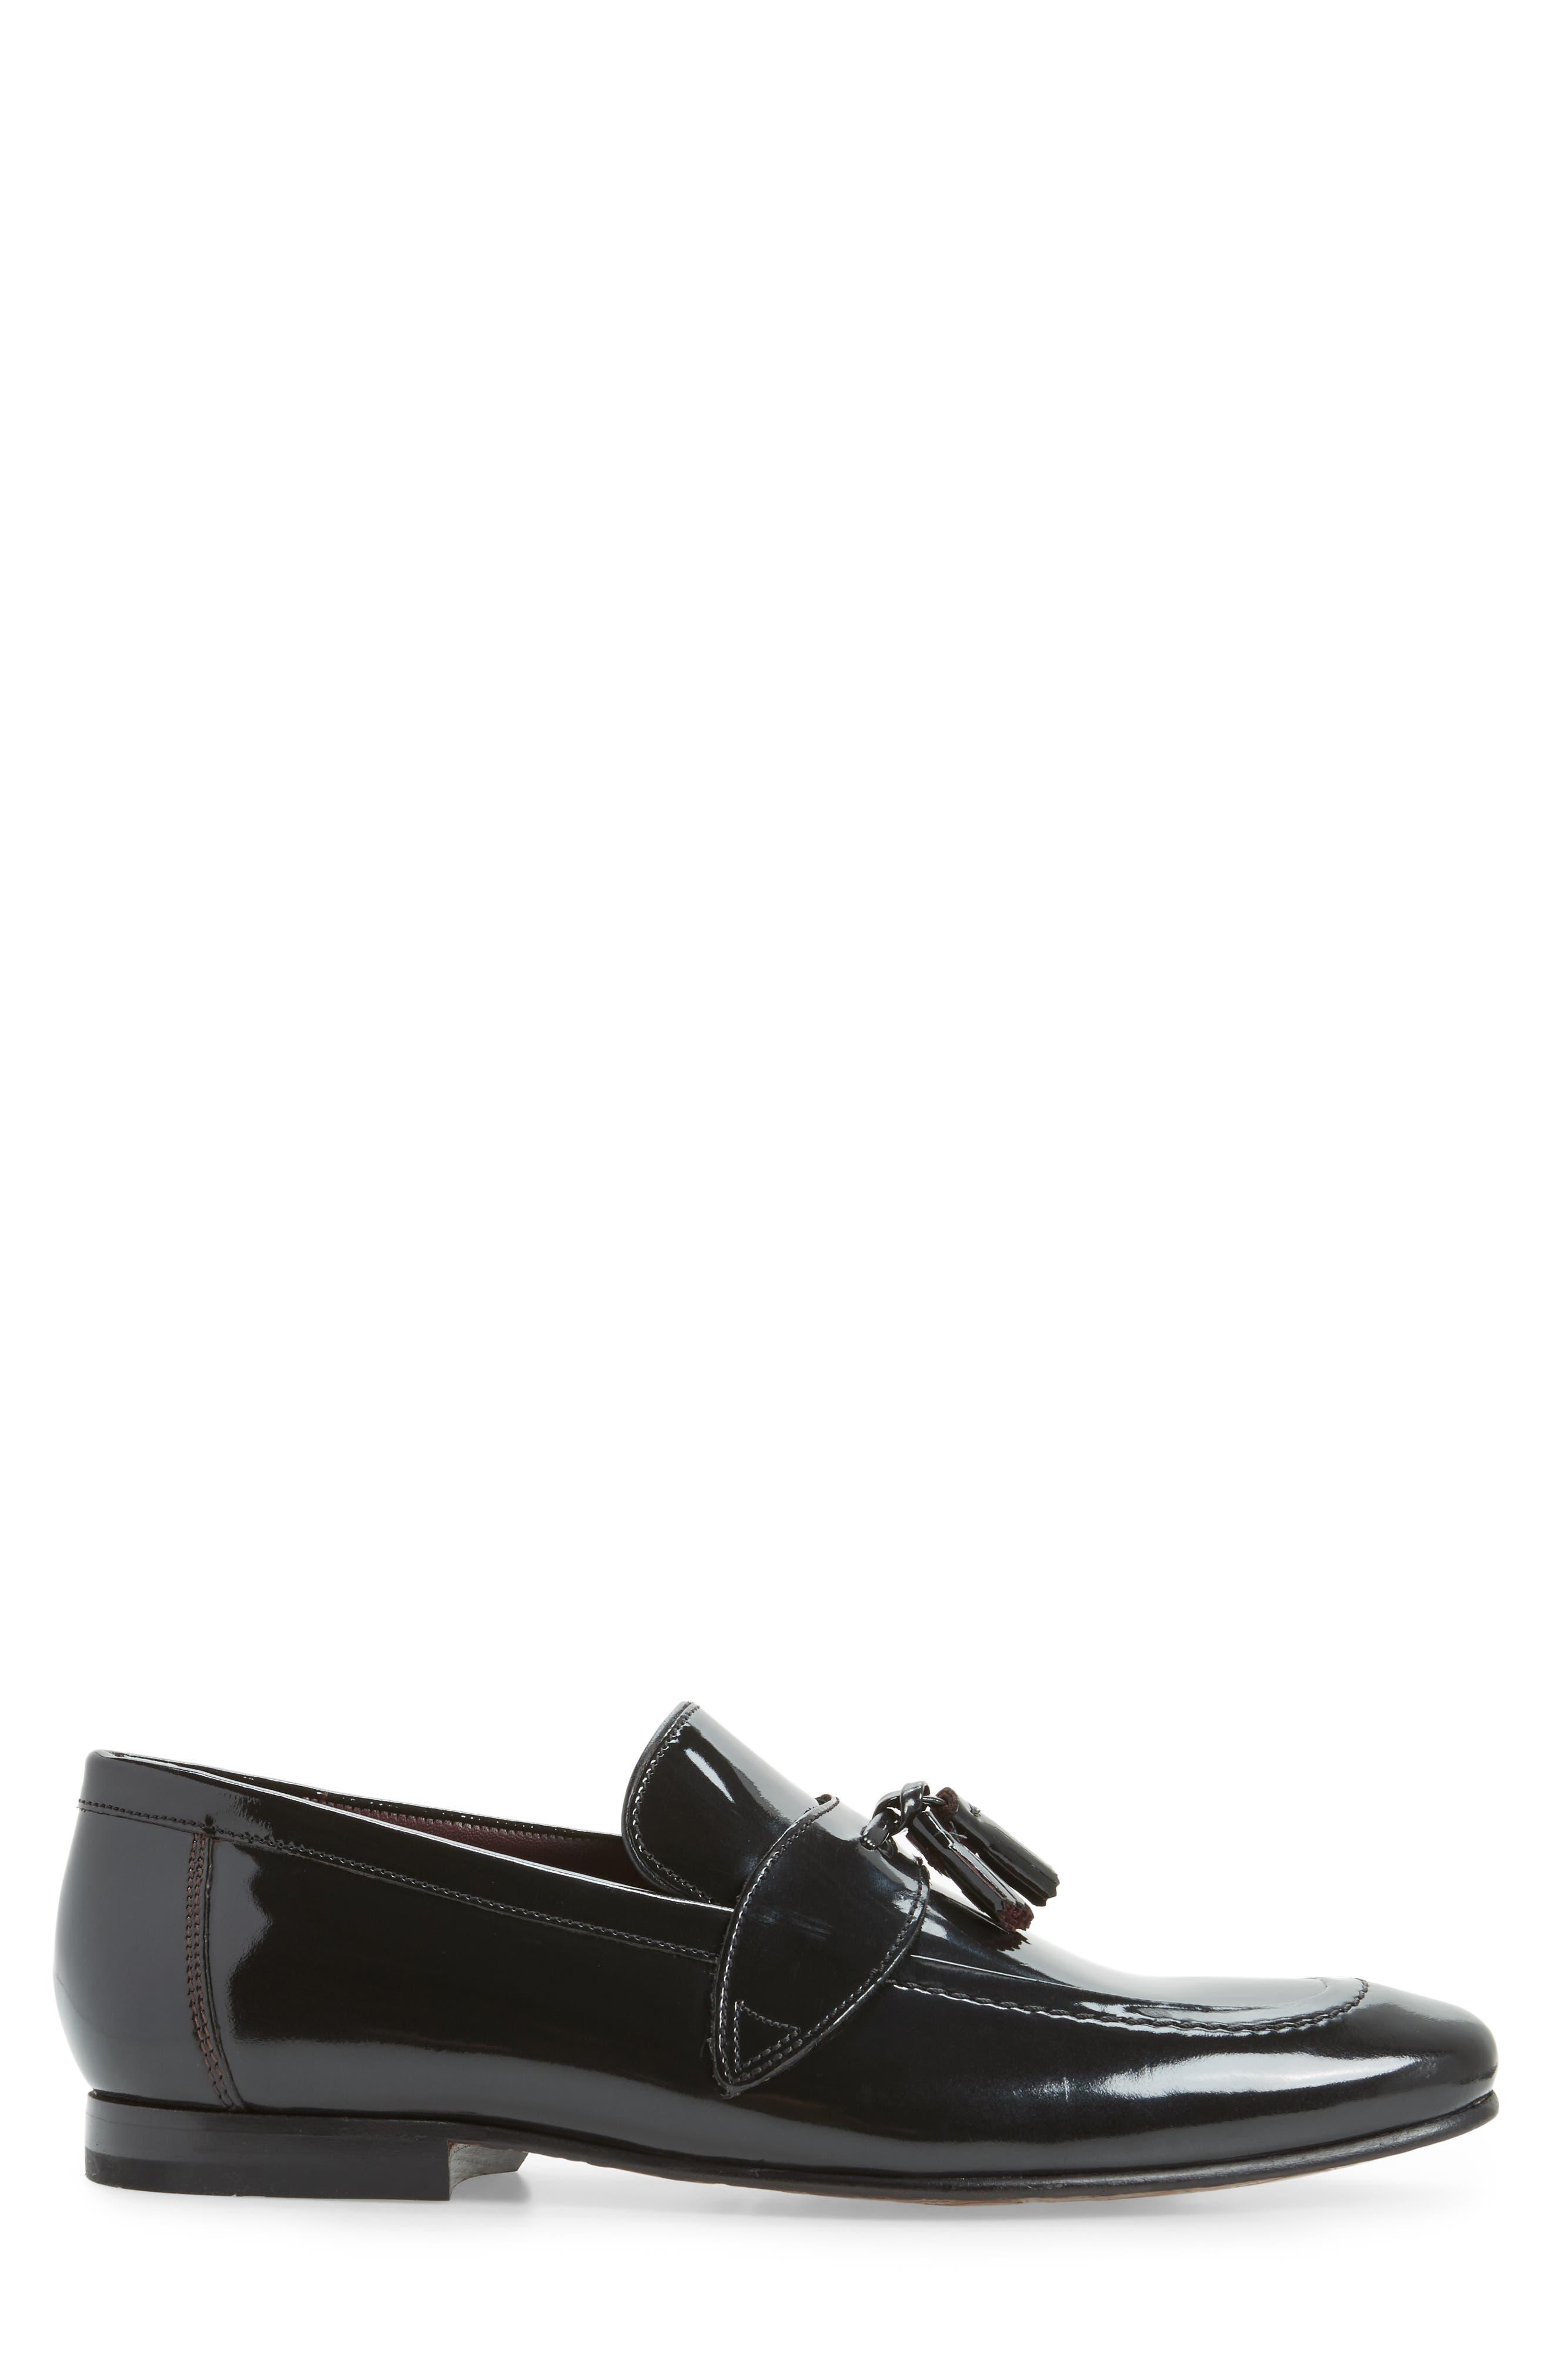 Grafit Tassel Loafer,                             Alternate thumbnail 3, color,                             Black Patent Leather